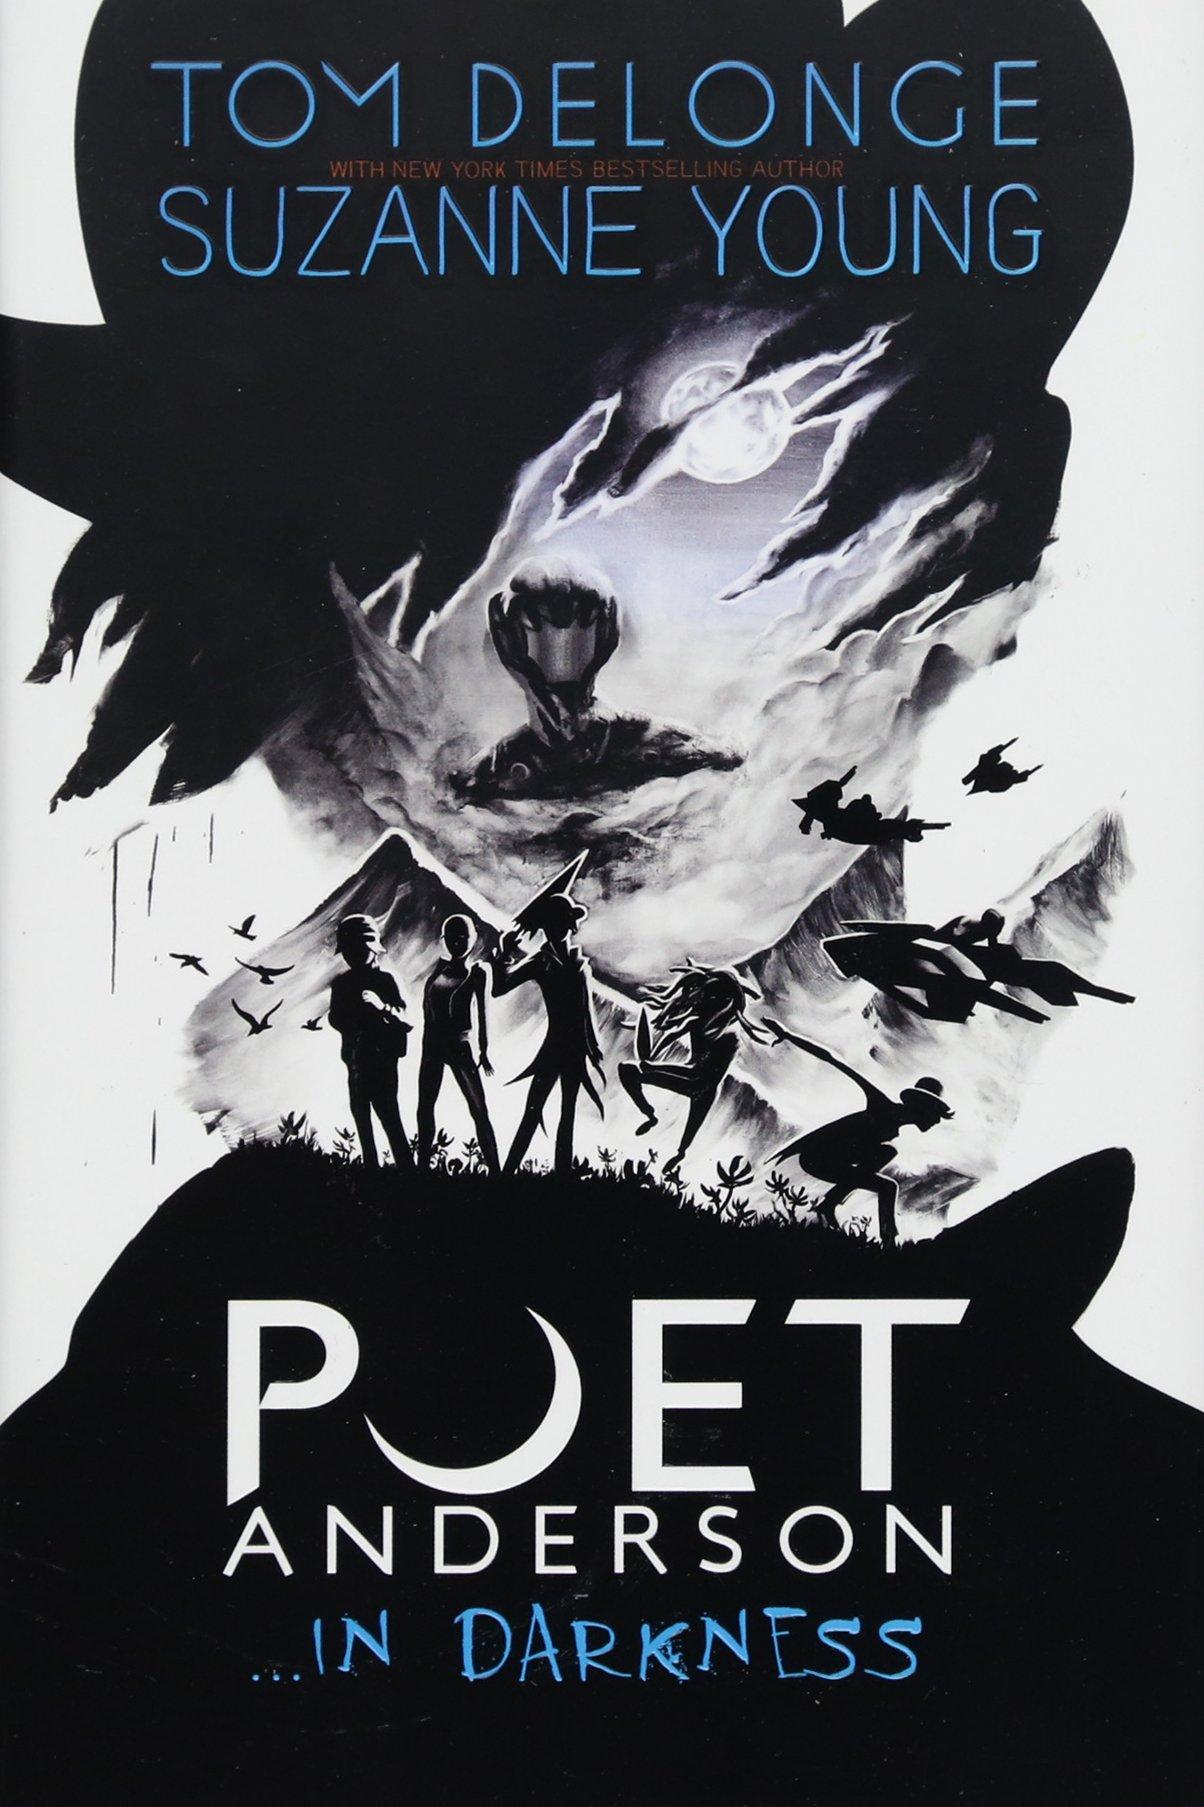 amazon com poet anderson in darkness 9781943272327 tom